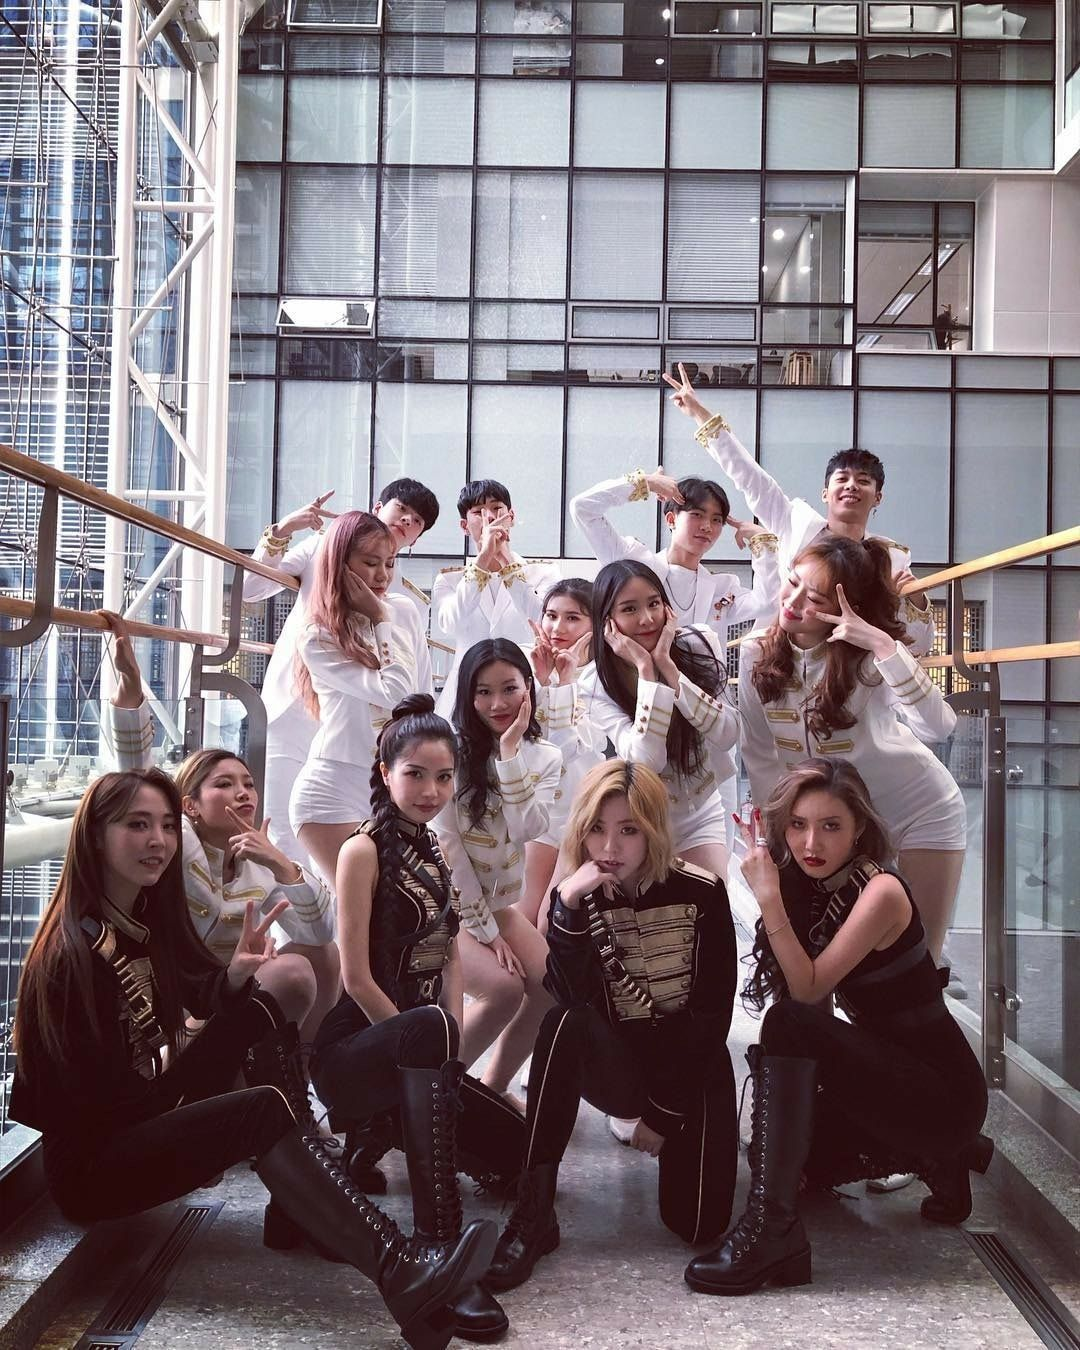 MAMAMOO x Backup Dancers | MBC Gayo Daejejeon | Mostly MMM in 2019